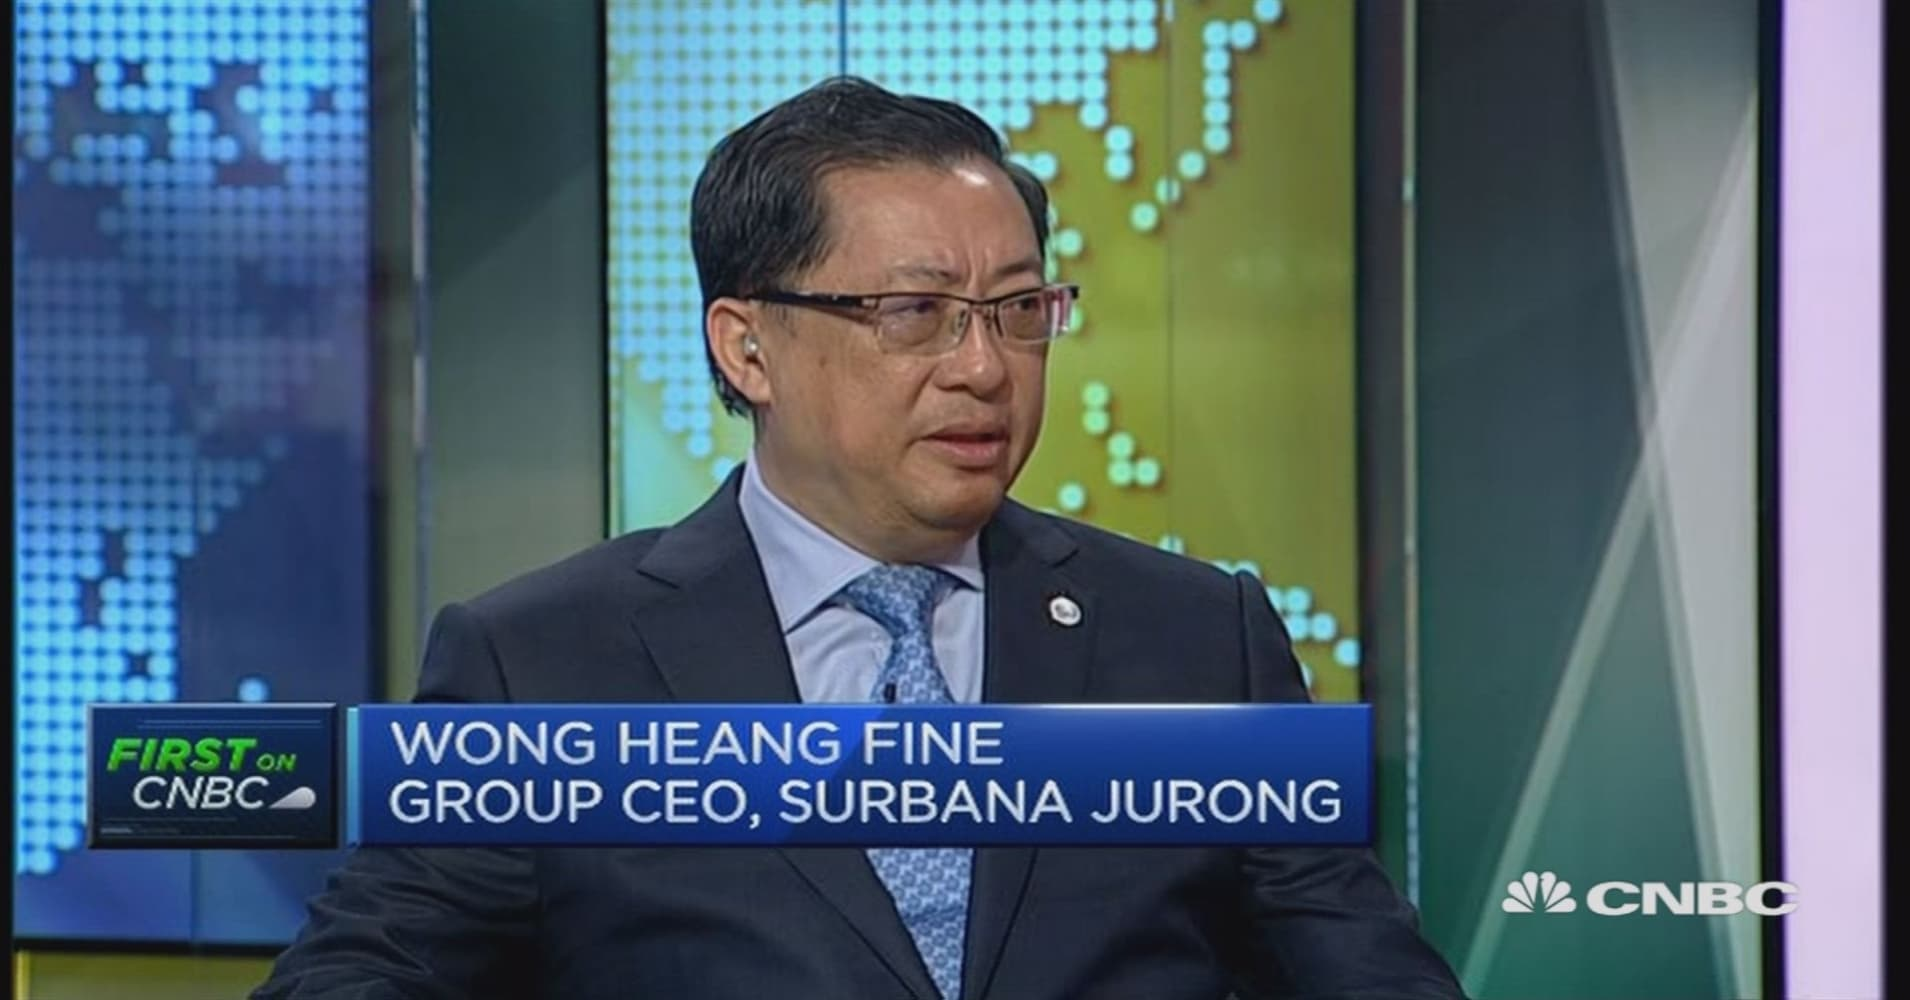 Singapore Surbana Jurong buys Australian SMEC to create consulting giant 57